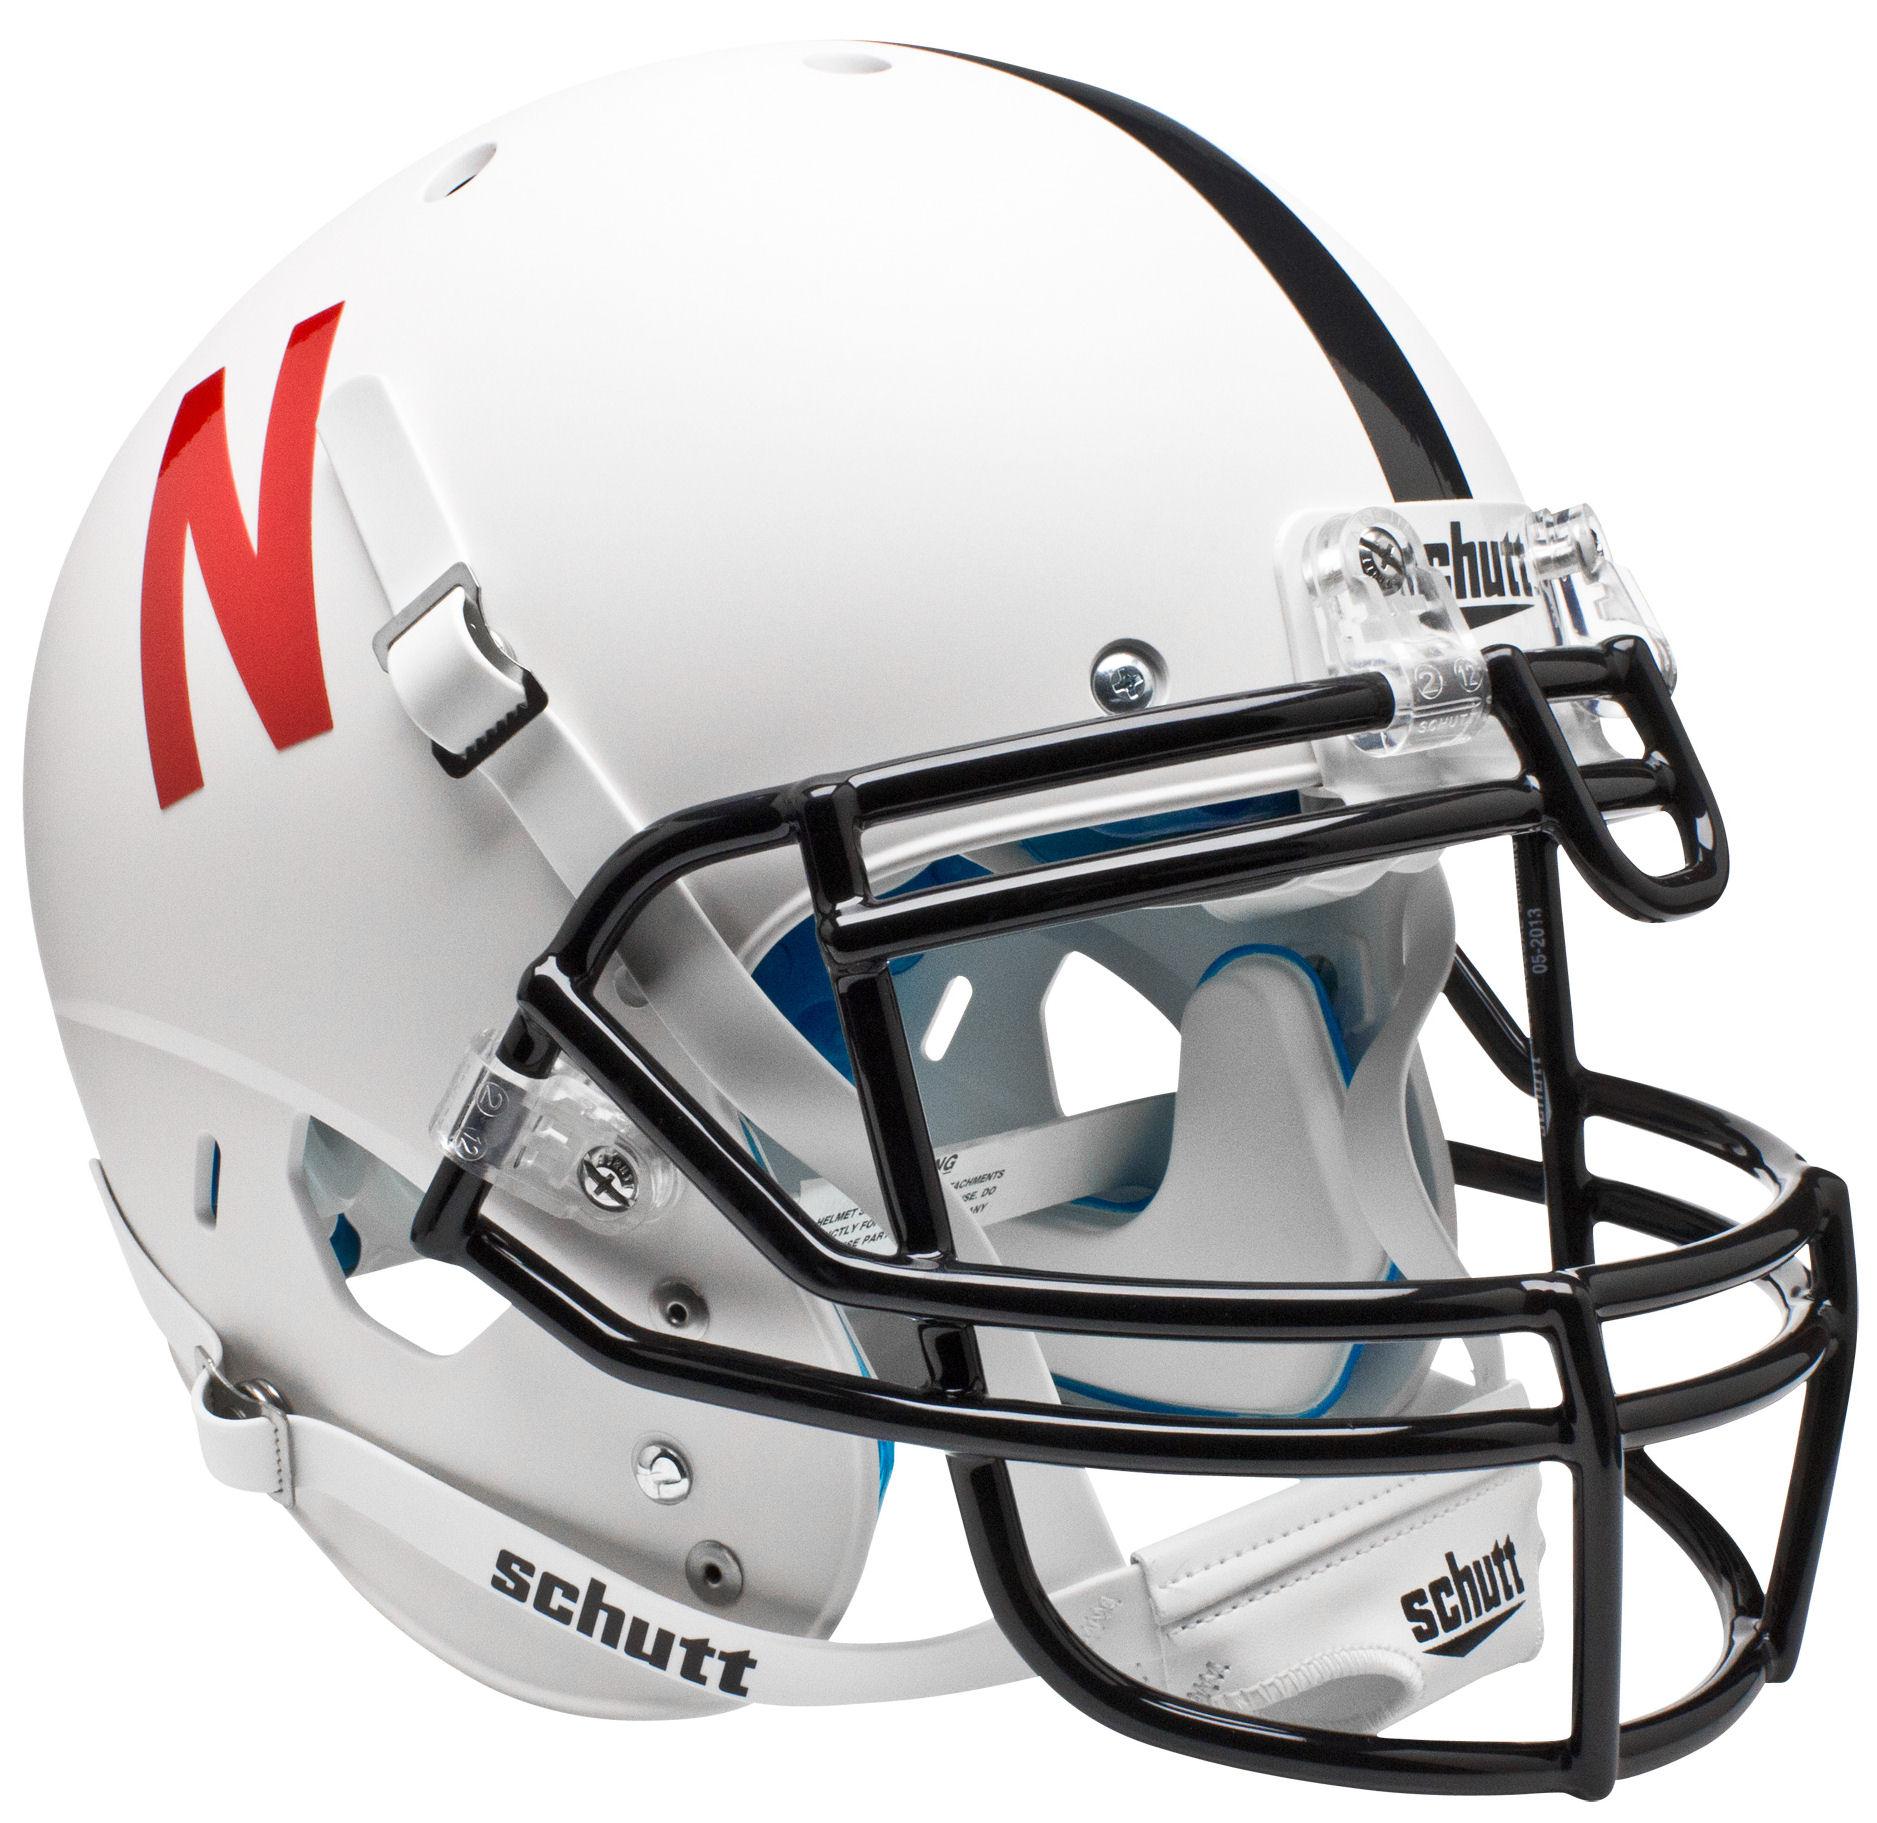 Nebraska Cornhuskers Authentic College XP Football Helmet Schutt <B>White</B>